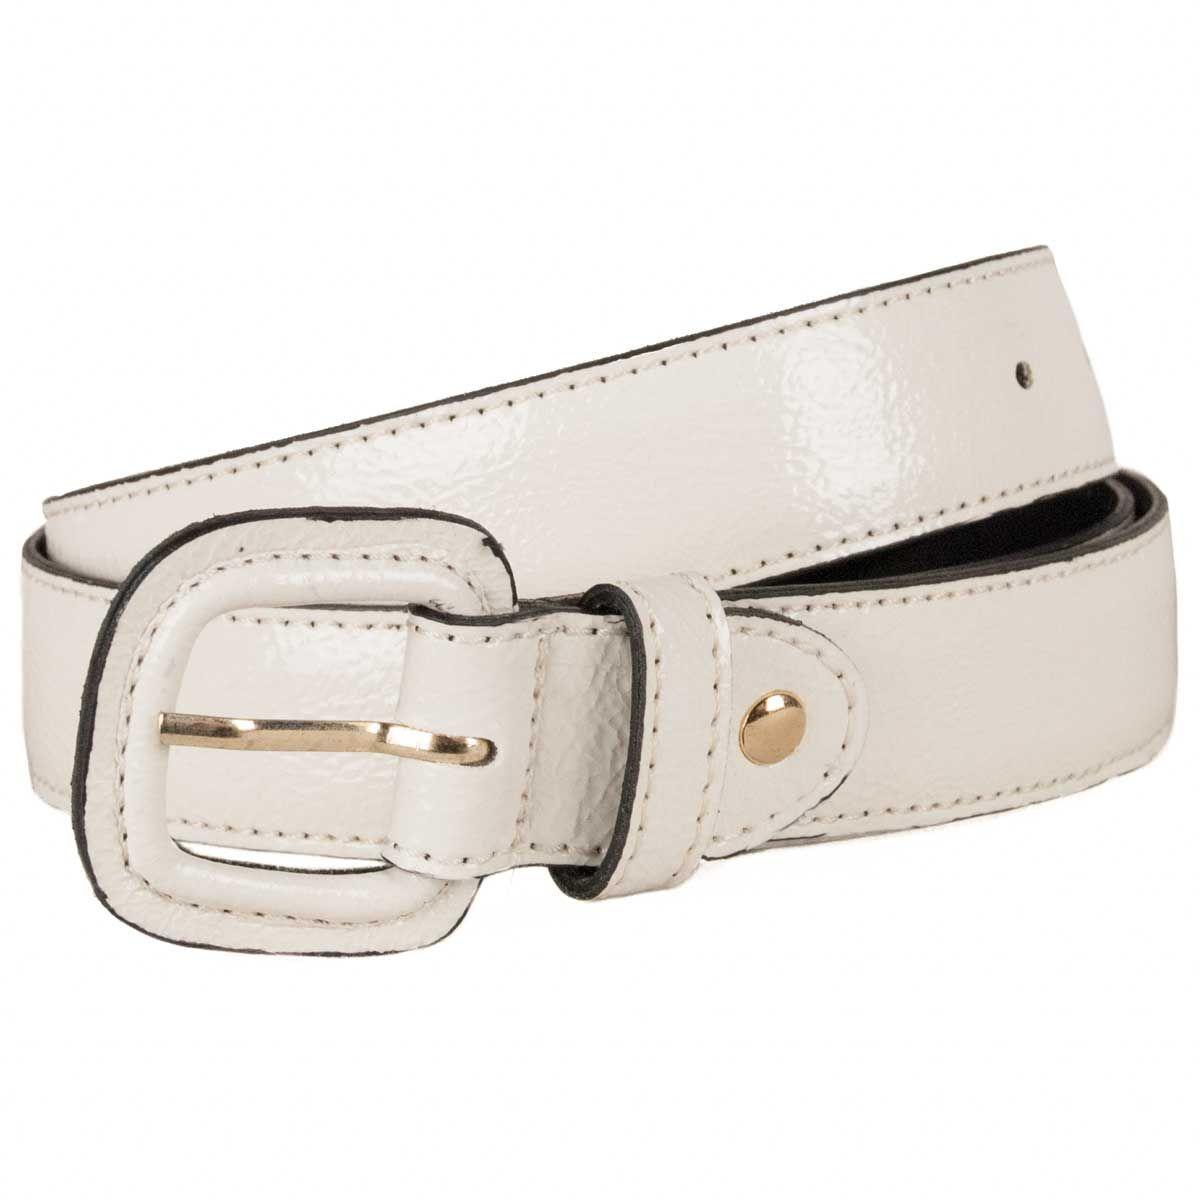 Montevita Casual Quality Belt in White